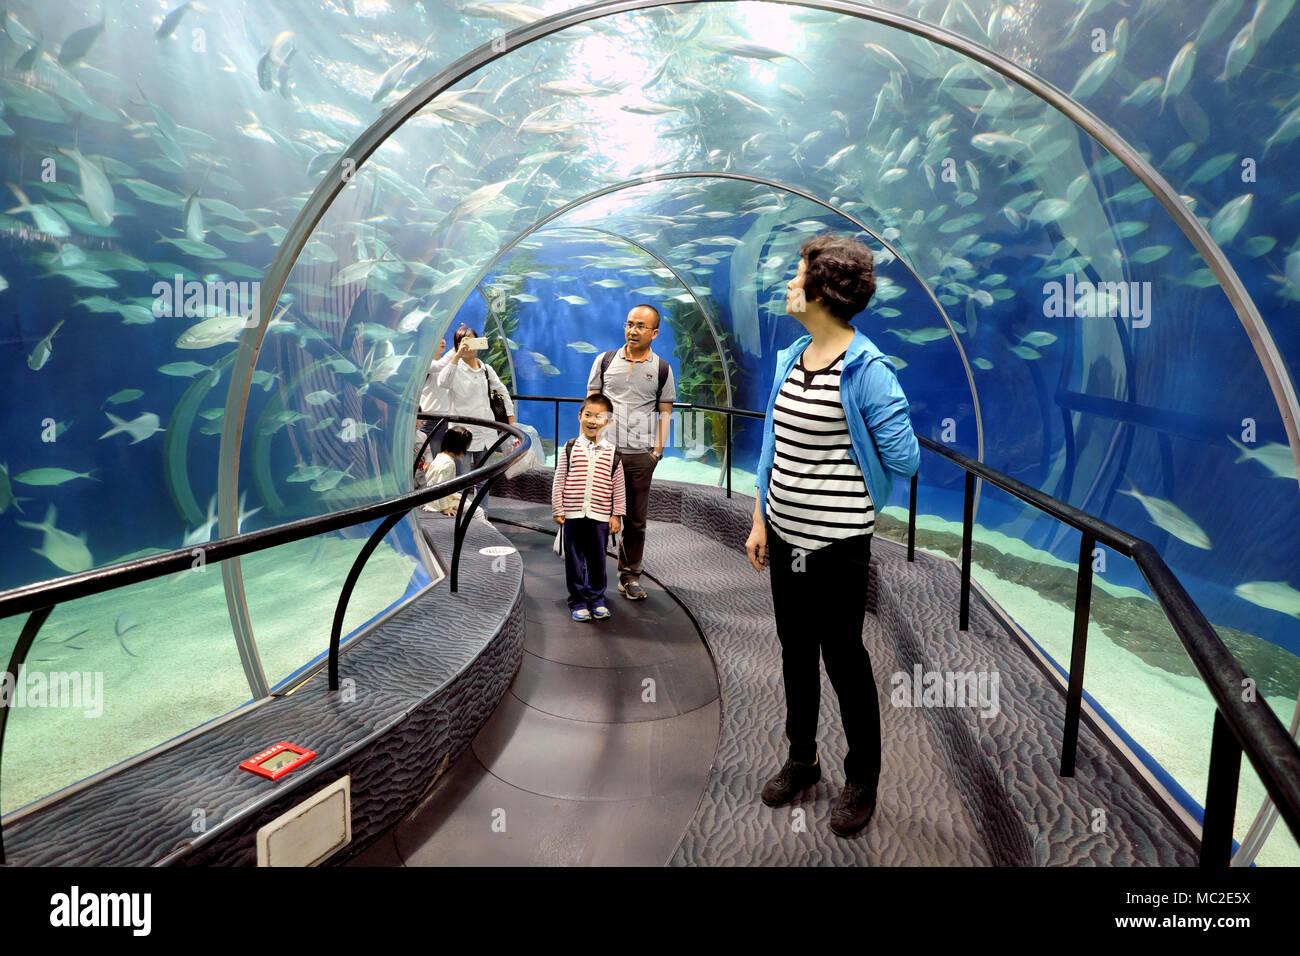 Family enjoying Shanghai Ocean Aquarium - moving through a tunnel on a conveyor belt (left), Shanghai, China Stock Photo